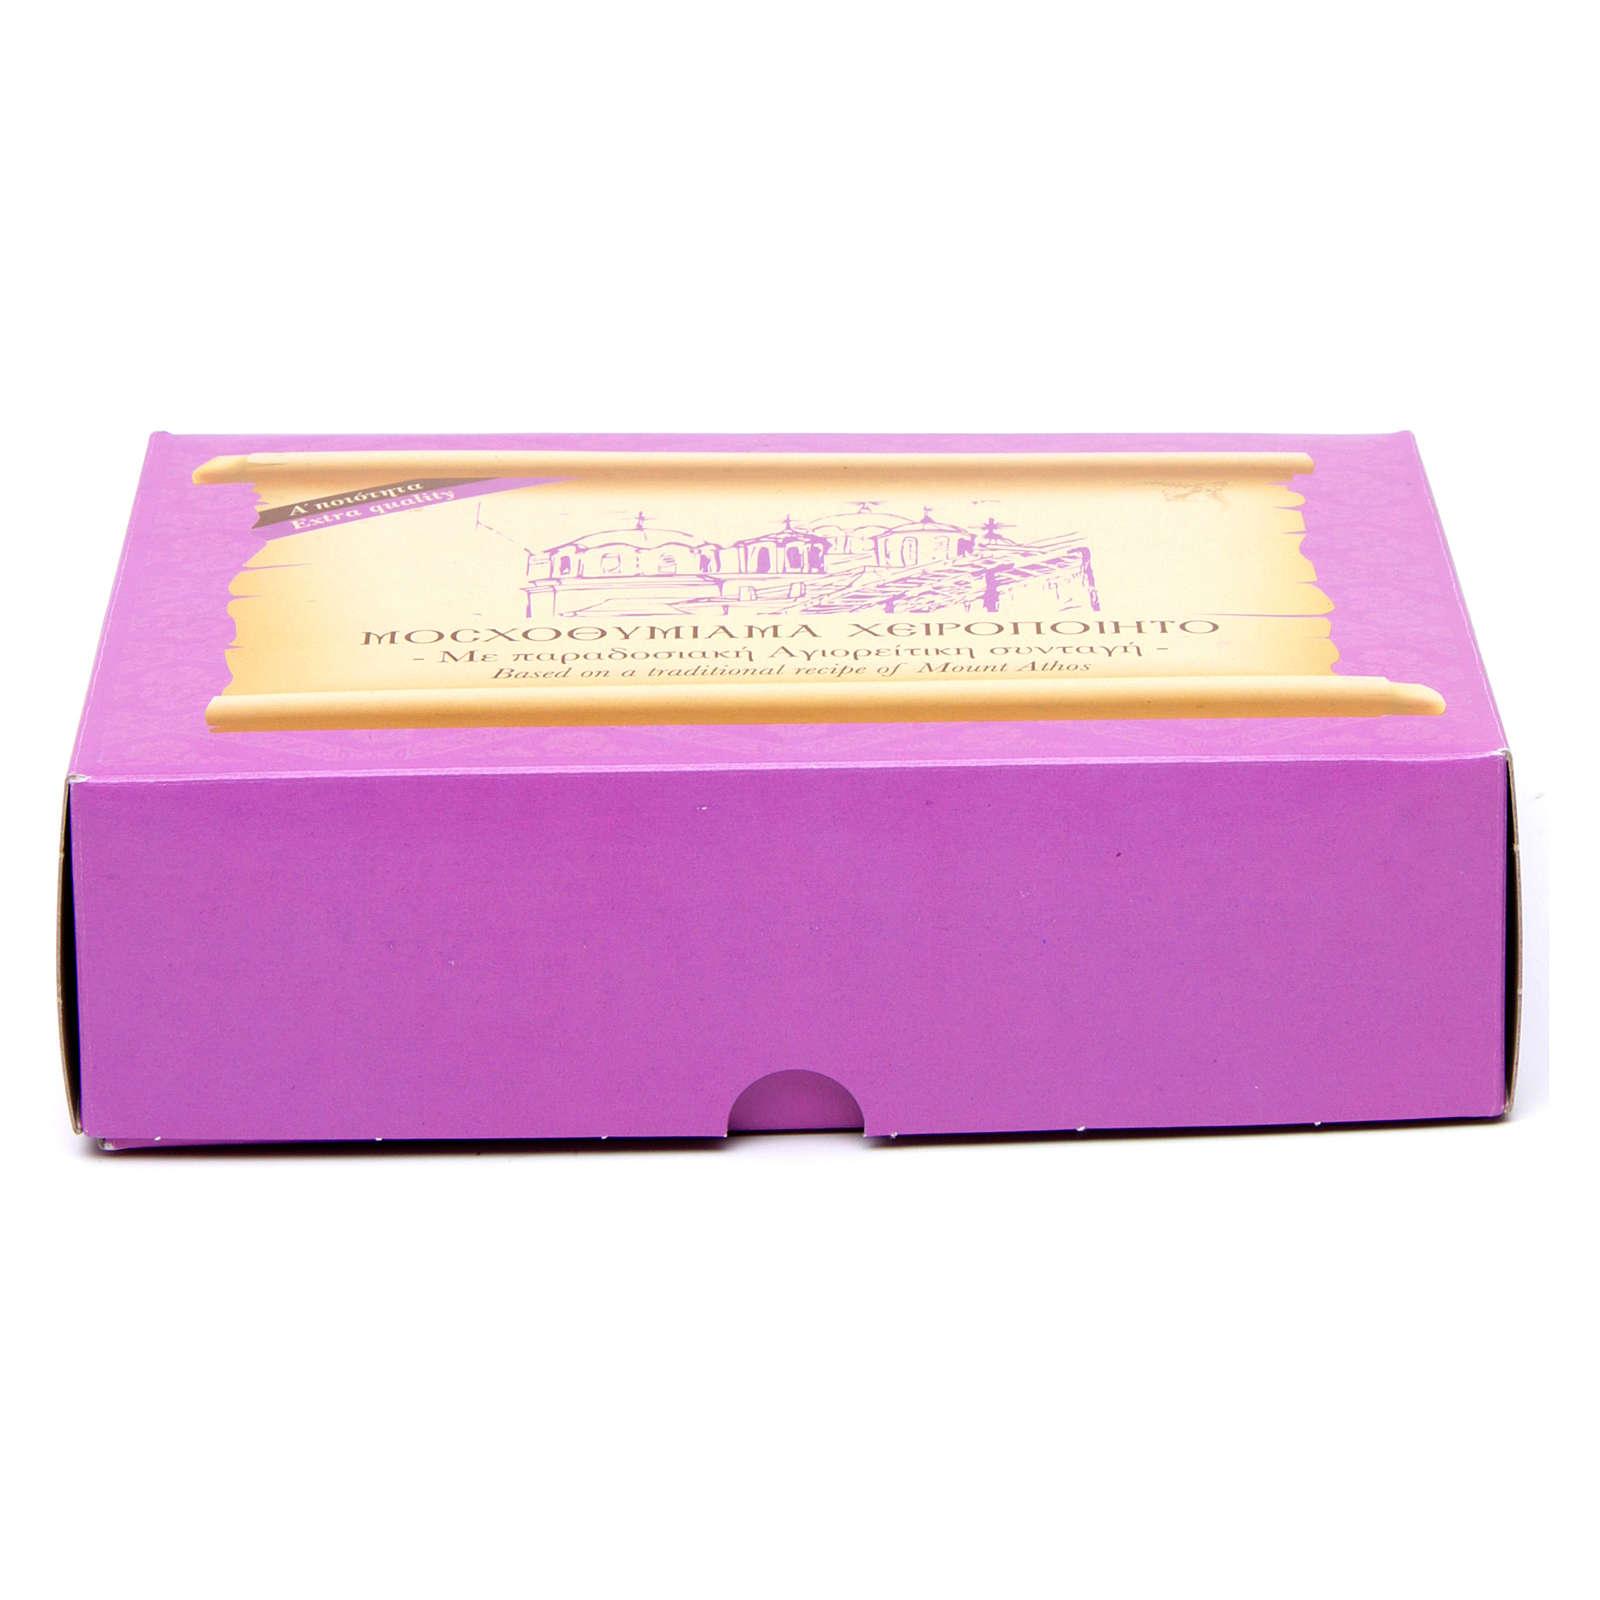 Vanilla-scented Greek incense 1 kg 3